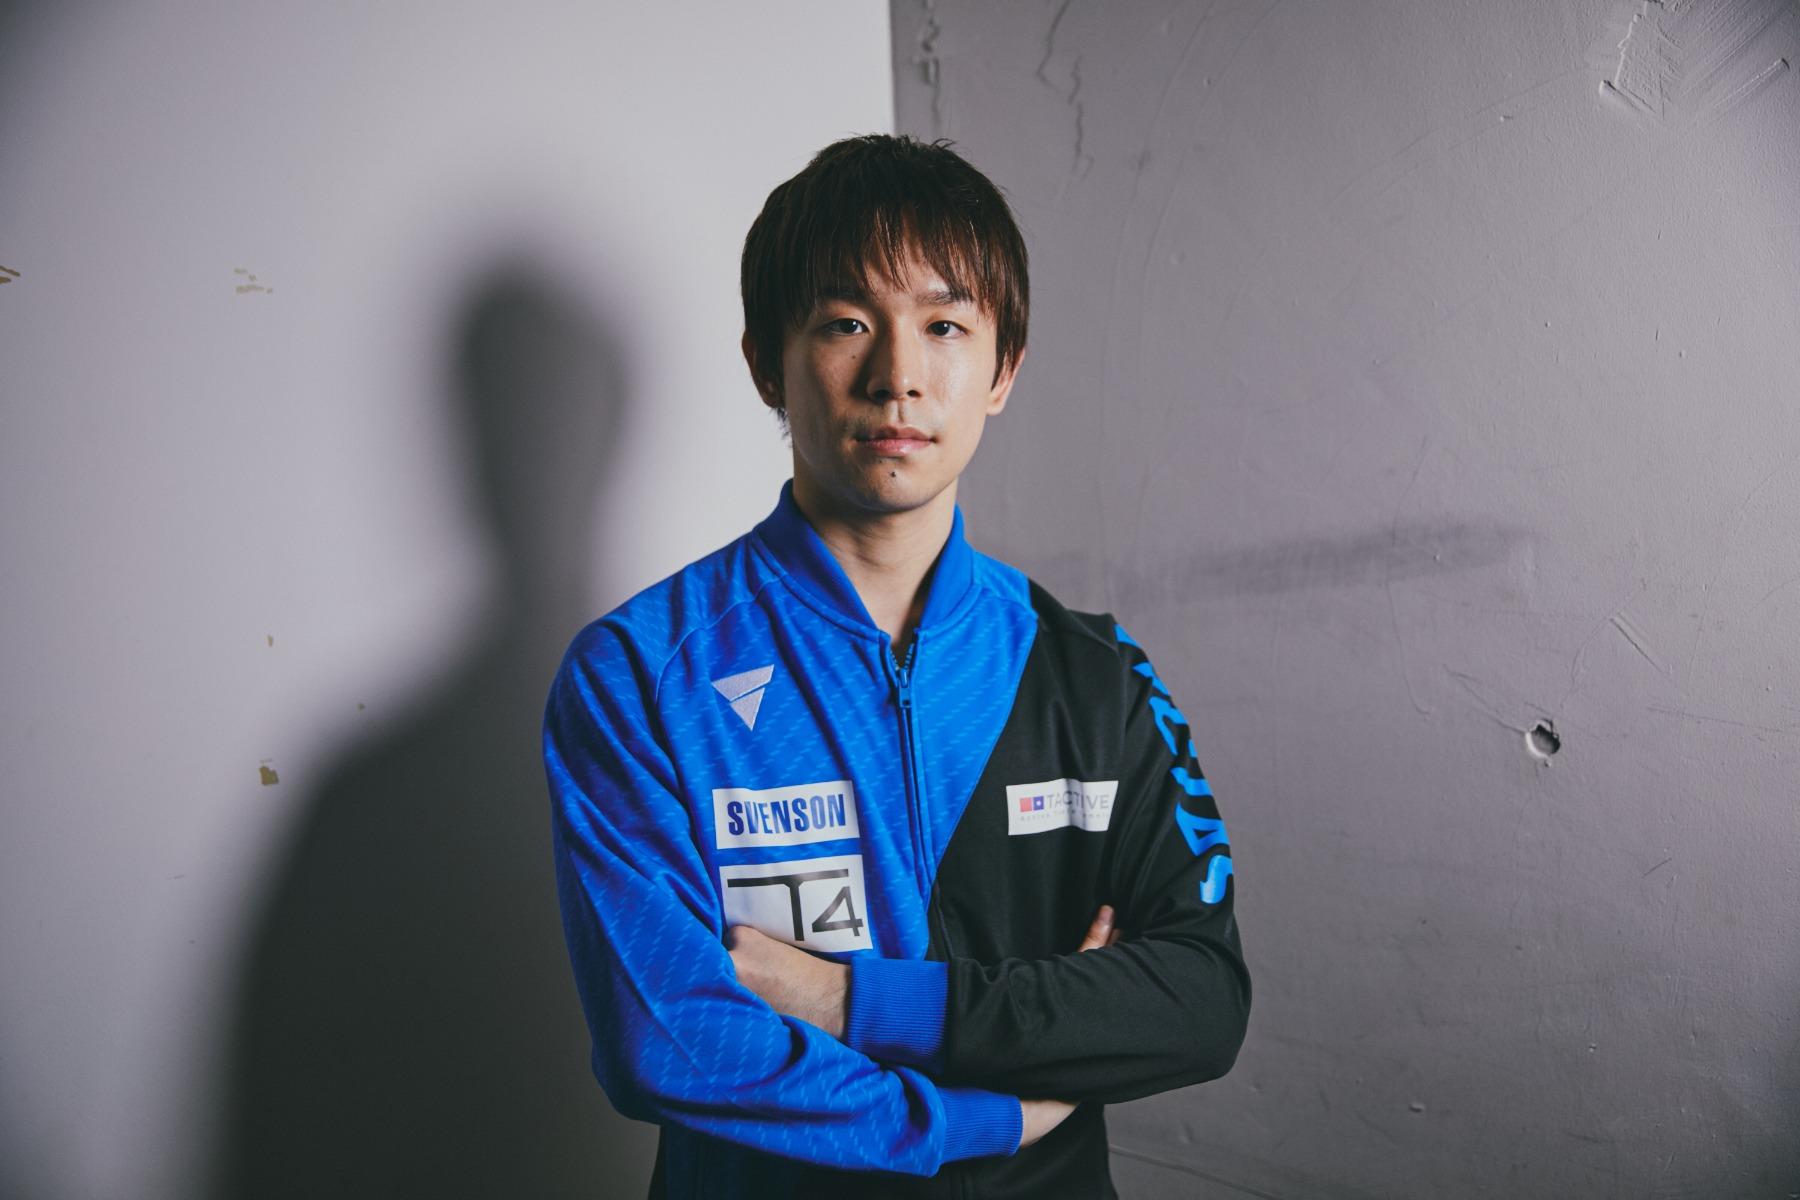 VICTAS 丹羽孝希 卓球 VICTAS JOURNAL 契約選手 ADVISORY STAFF アドバイザリースタッフ